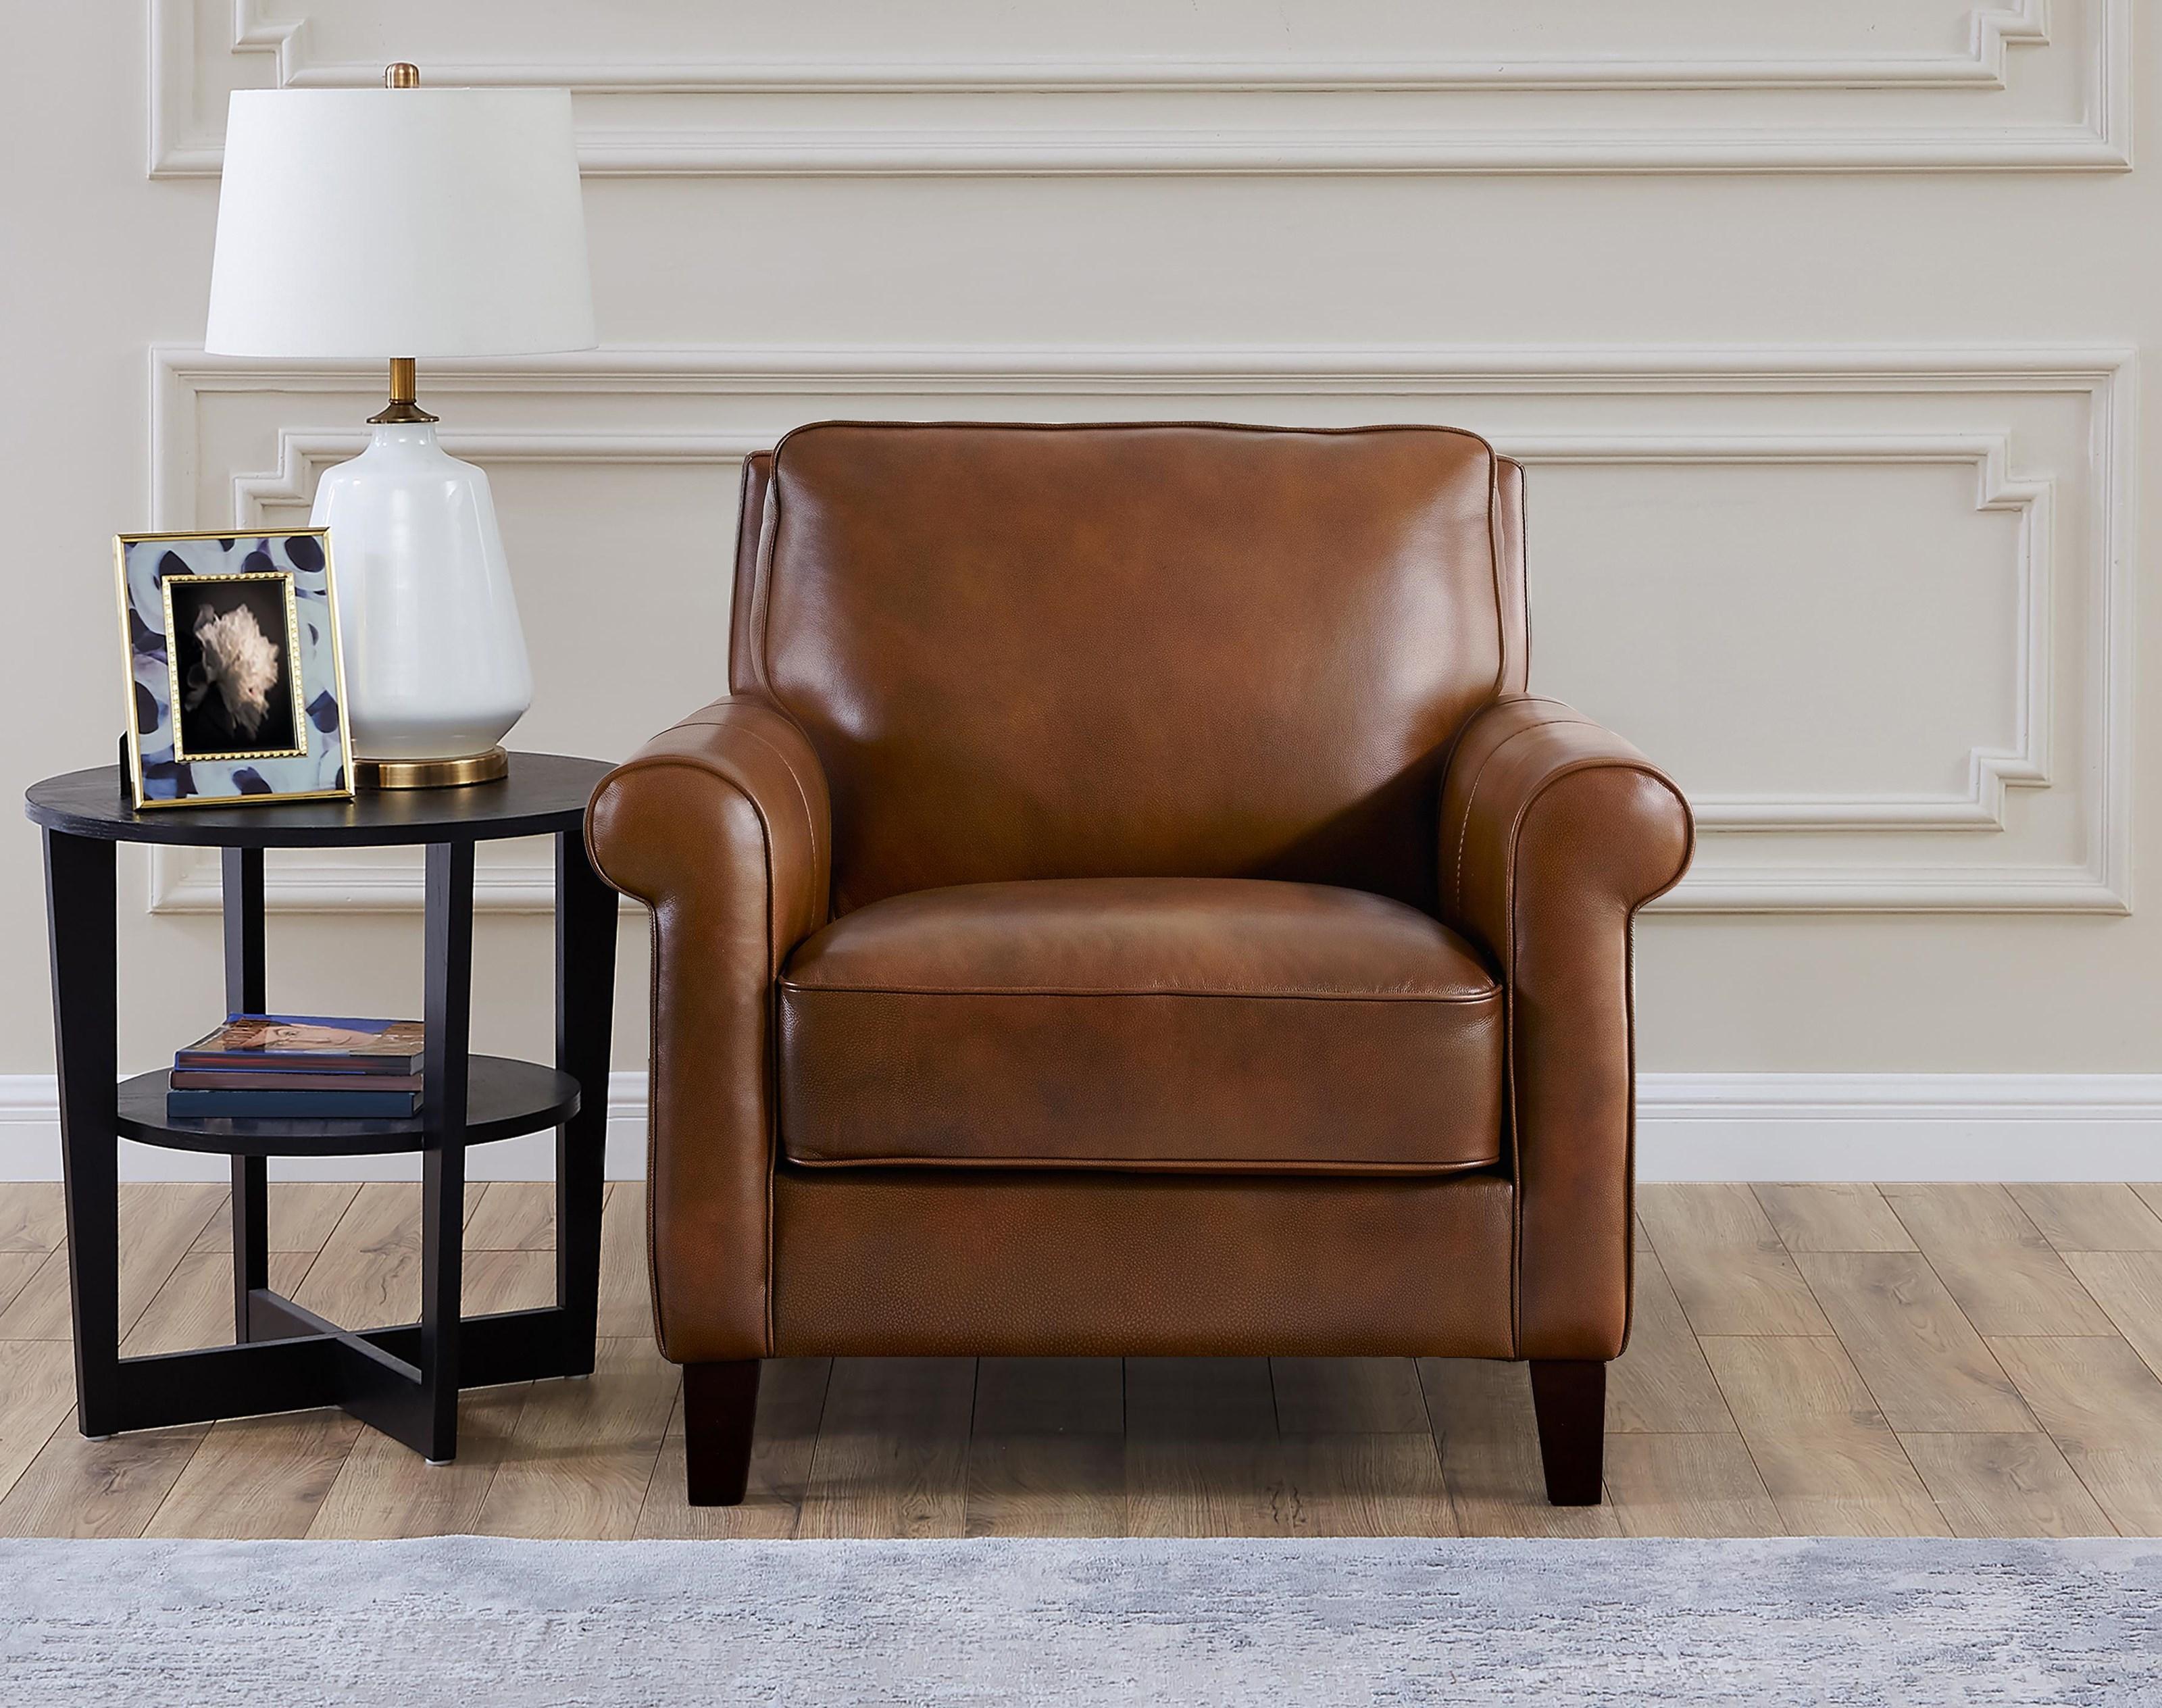 New London Dd New London Chiar by Amax at Stoney Creek Furniture